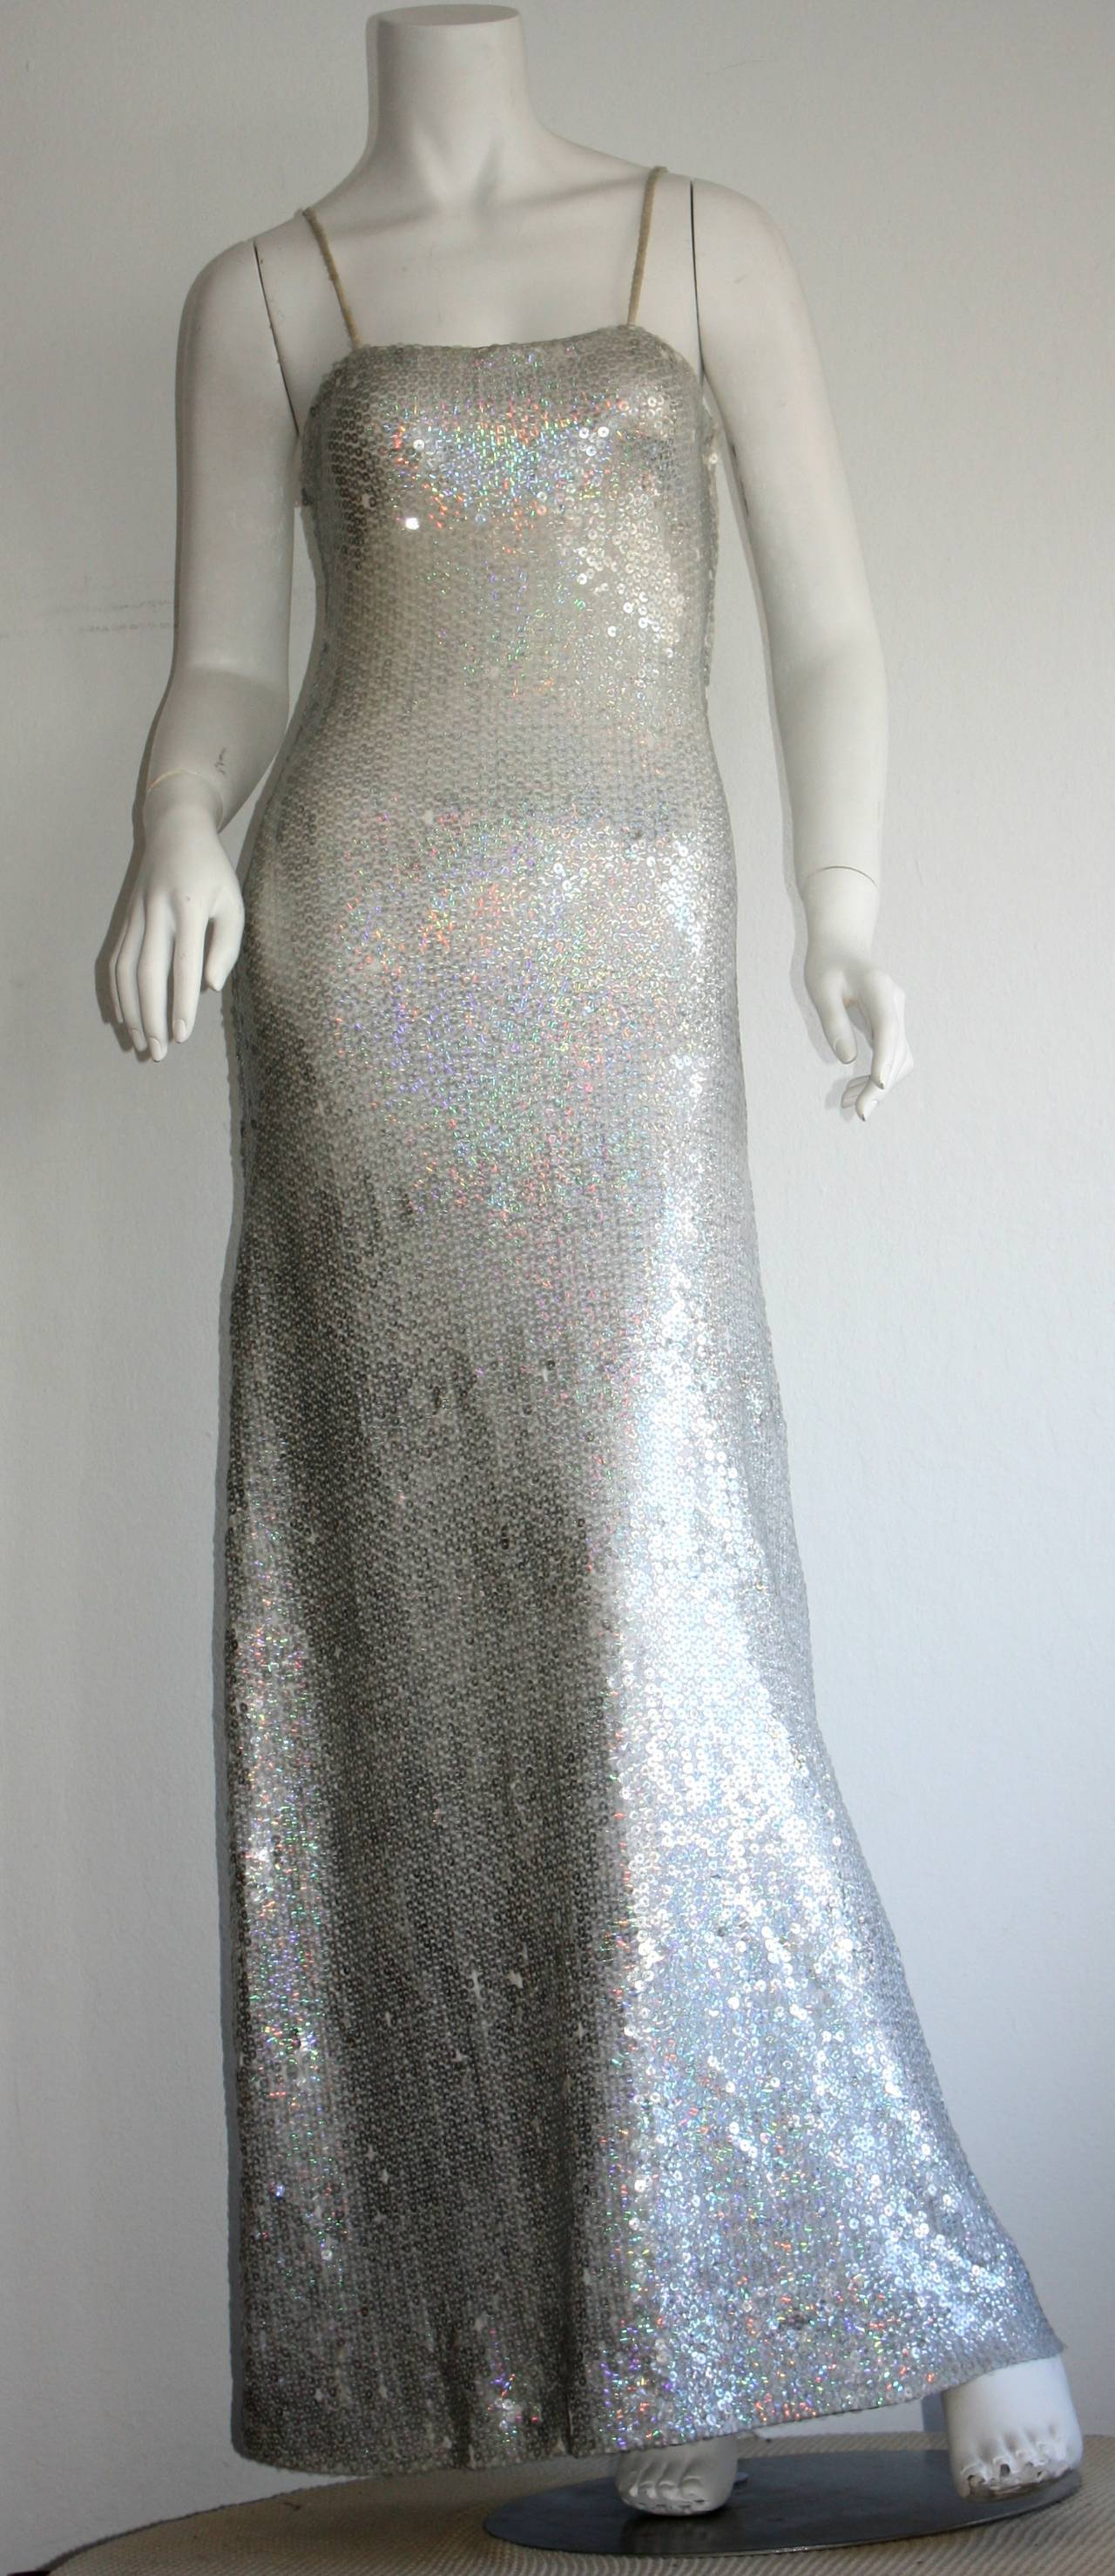 Vintage Halston 1970s Iridescent Sequin Mermaid Gown at 1stdibs